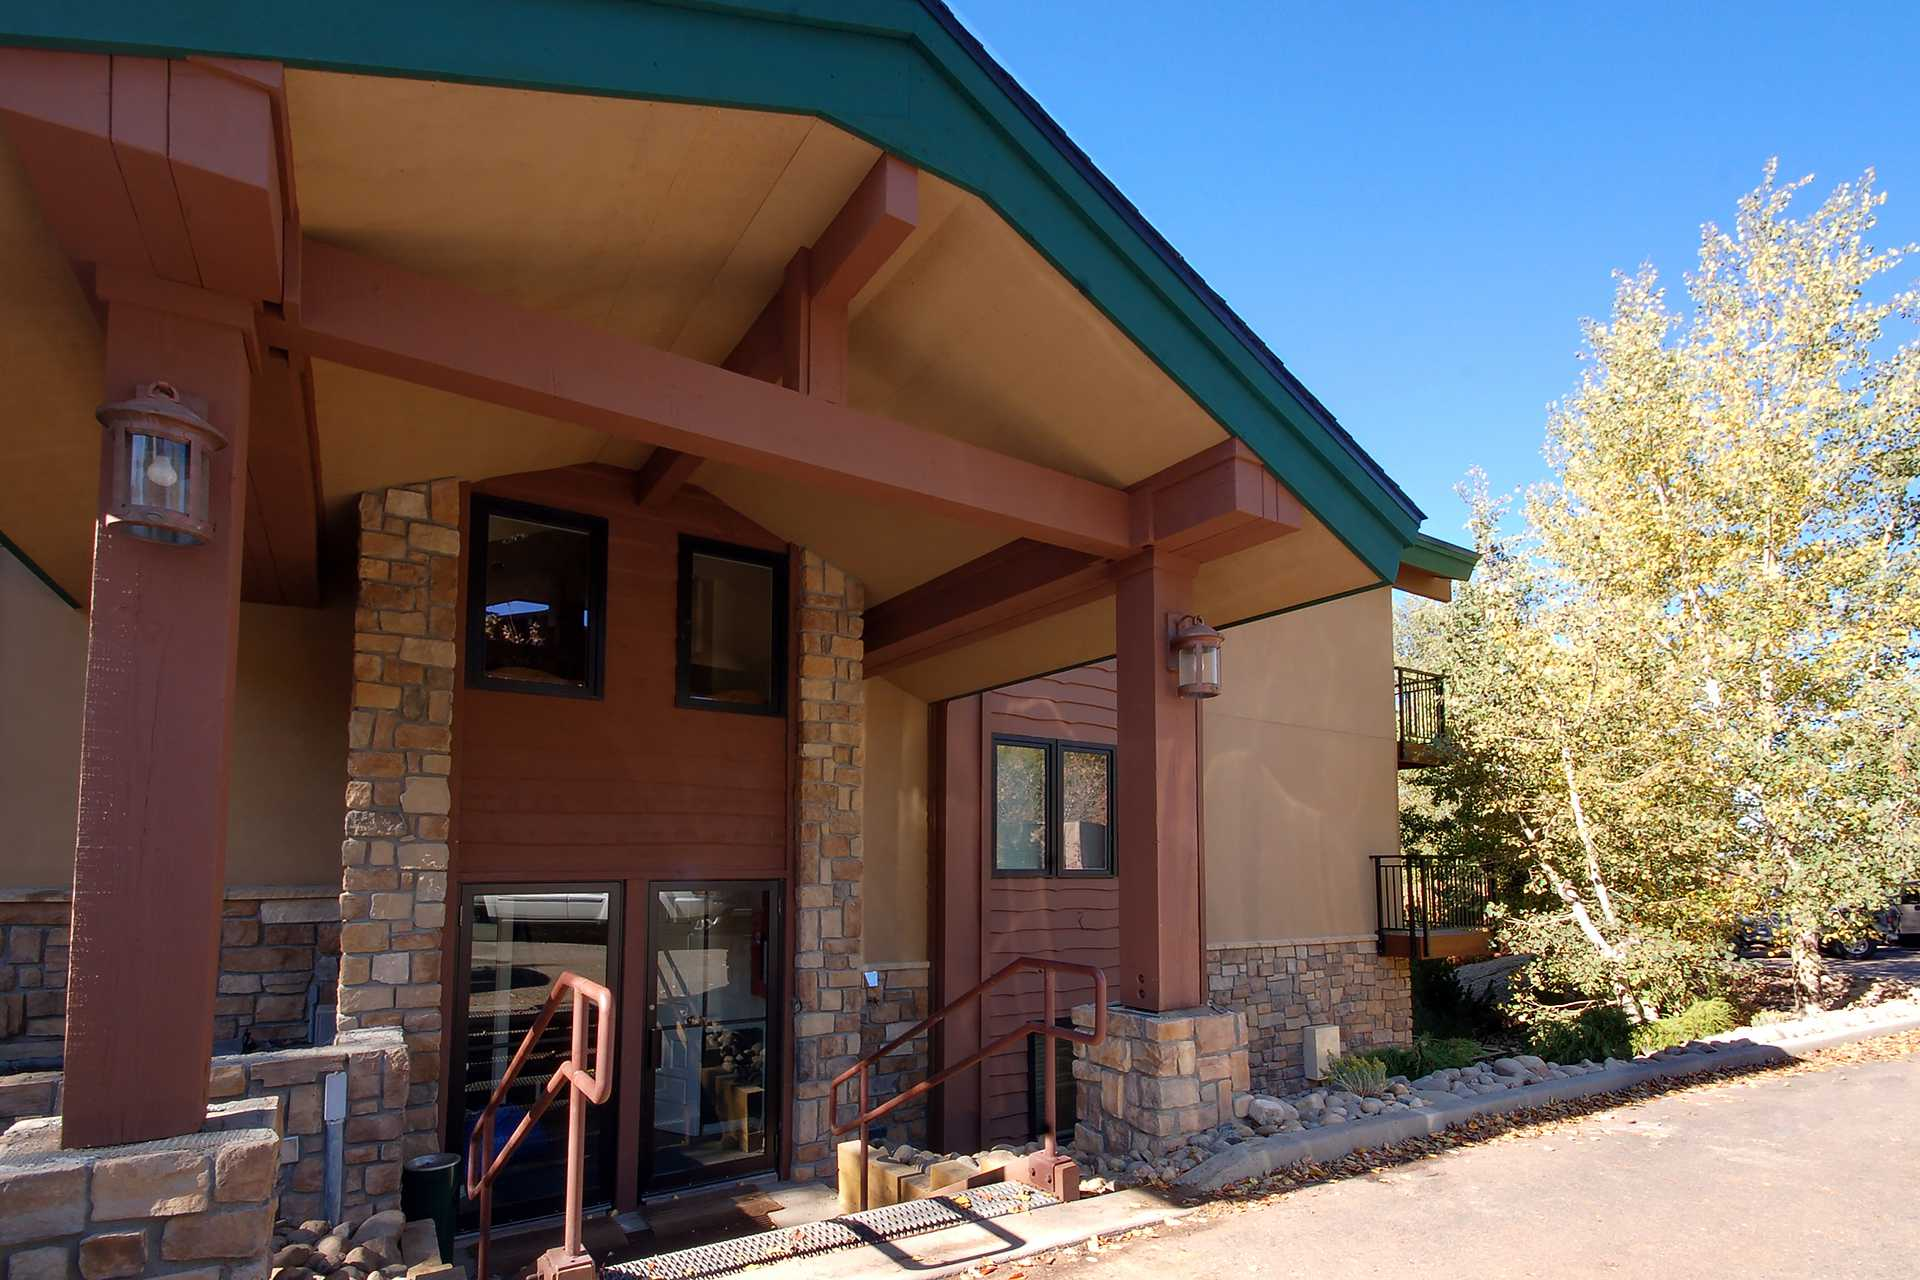 SL301 - Scandinavian Lodge and Condominiums